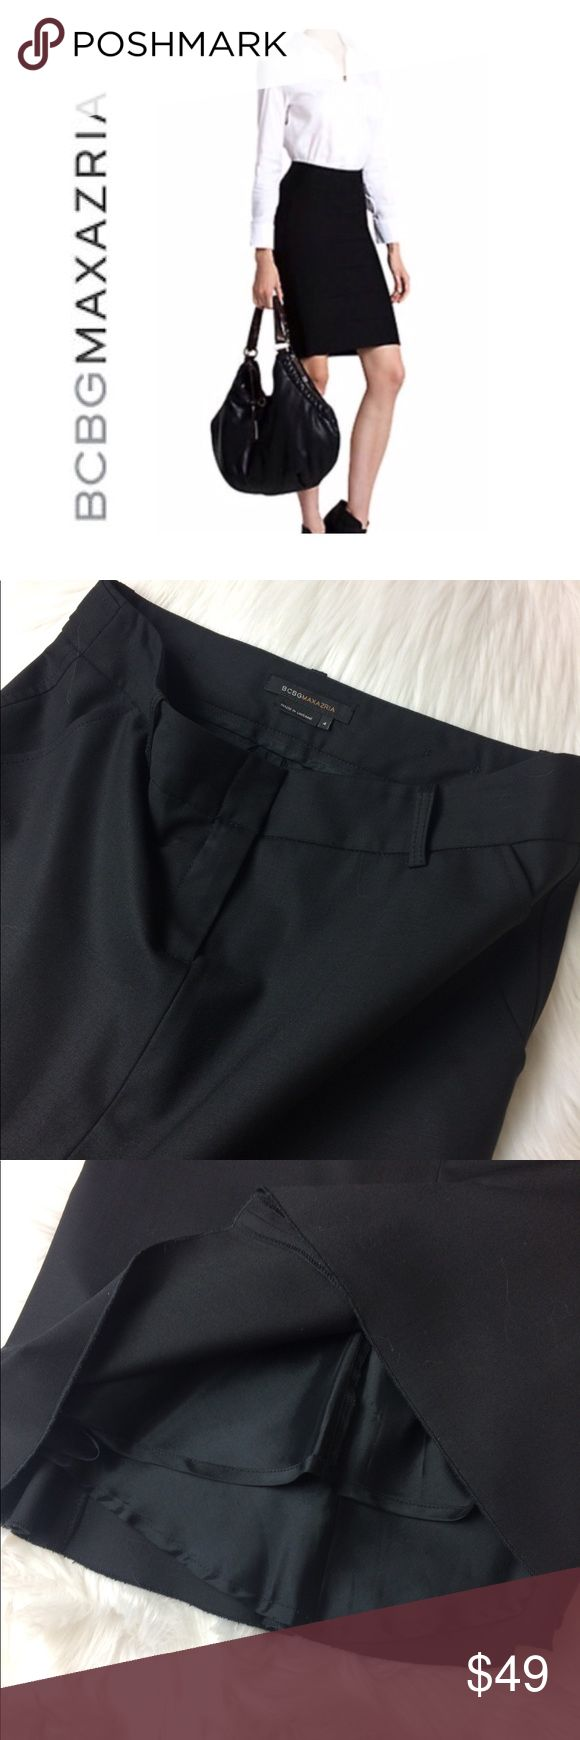 "BCBGMaxAzria Skirt BCBGMaxAzria black pencil skirt, raw edge style hem, belt loops with a flare in the back, NWOT wool and spandex, waist 30"", length 22"", hips 35"" BCBGMaxAzria Skirts Pencil"